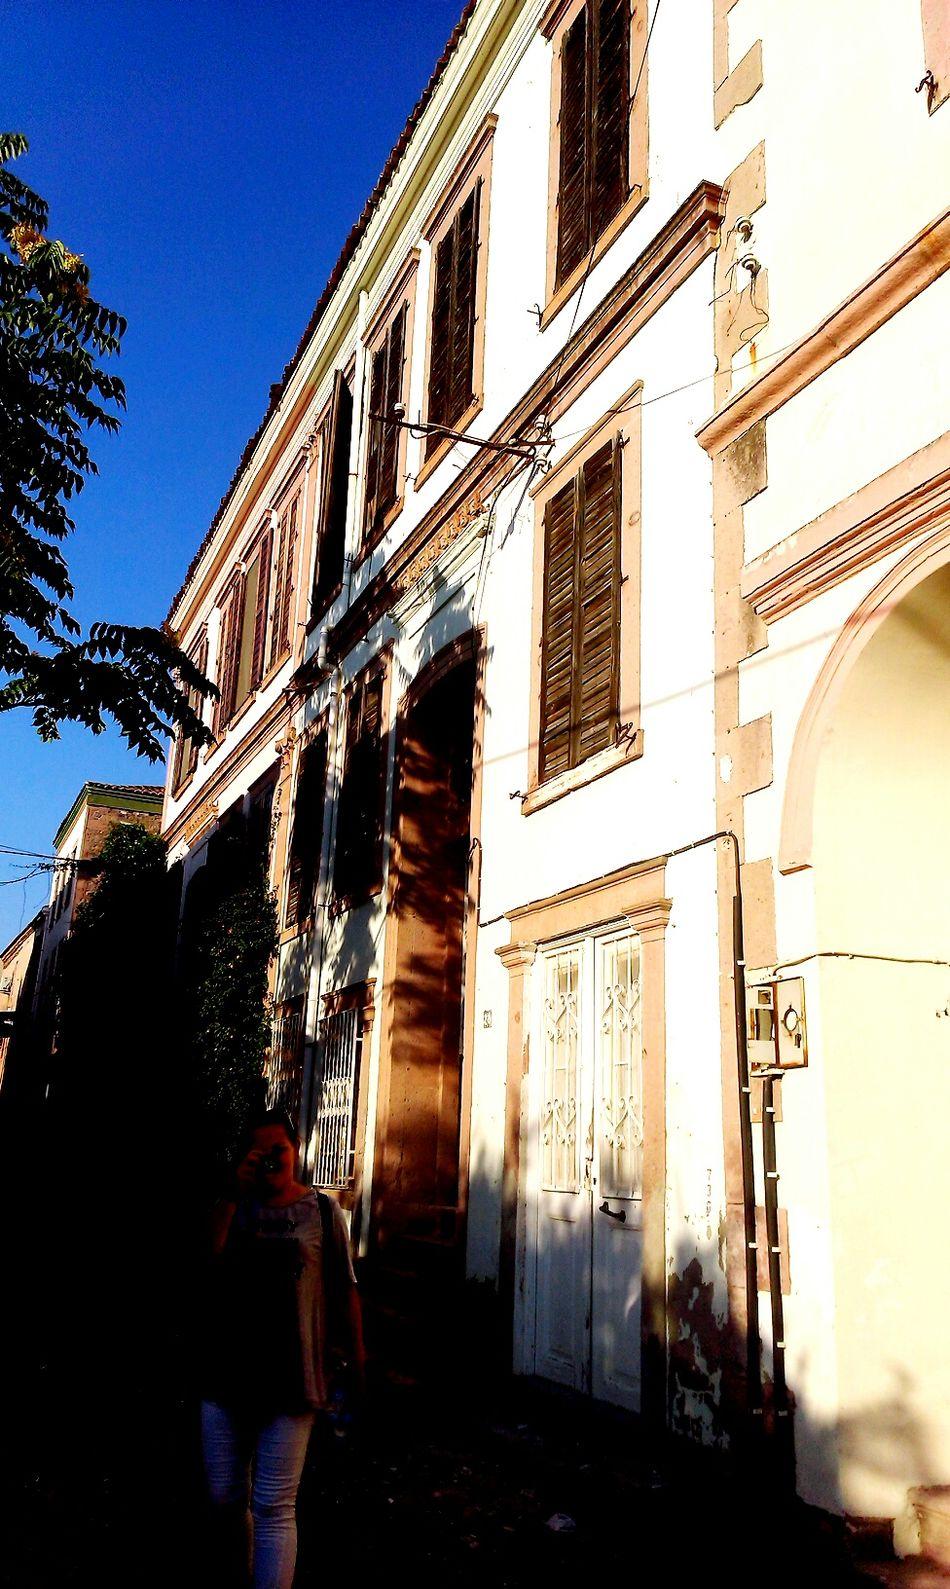 Turkey Balikesir Cunda Island Check This Out Hanging Out Relaxing Enjoying Life Historical Building Nice Day Ayvalik 🐚🐳🐬🏊 Old House Windows Door Sweet♡